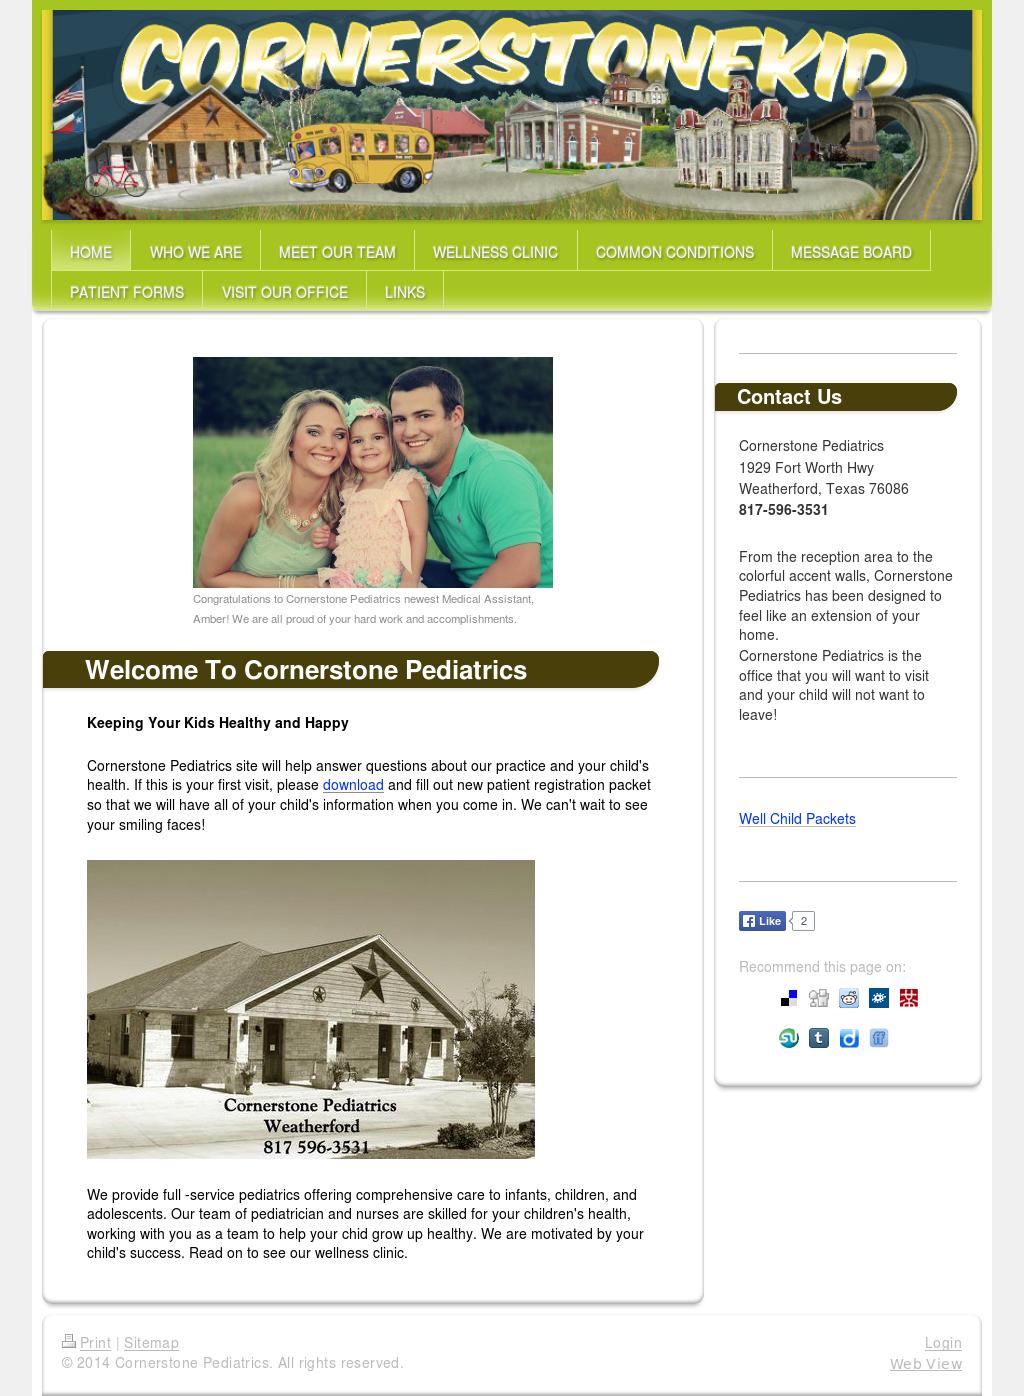 Cornerstone Pediatrics Competitors, Revenue and Employees